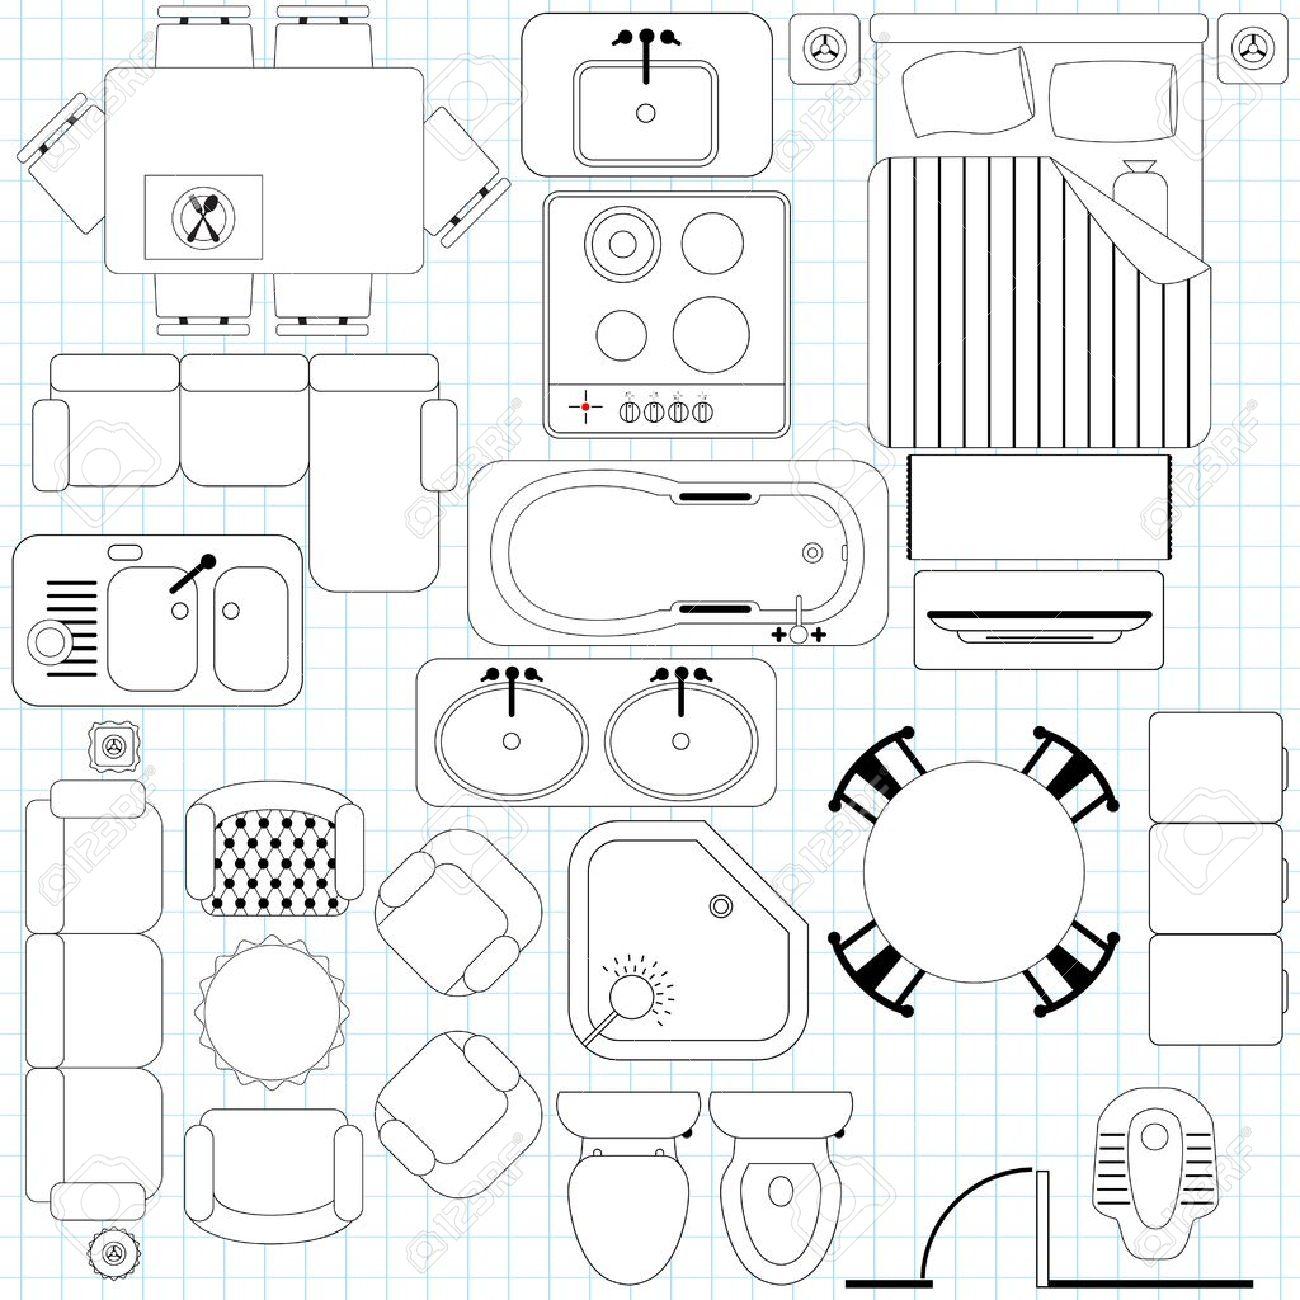 Furniture Floor Plans art small interior : furniture clipart for floor plans